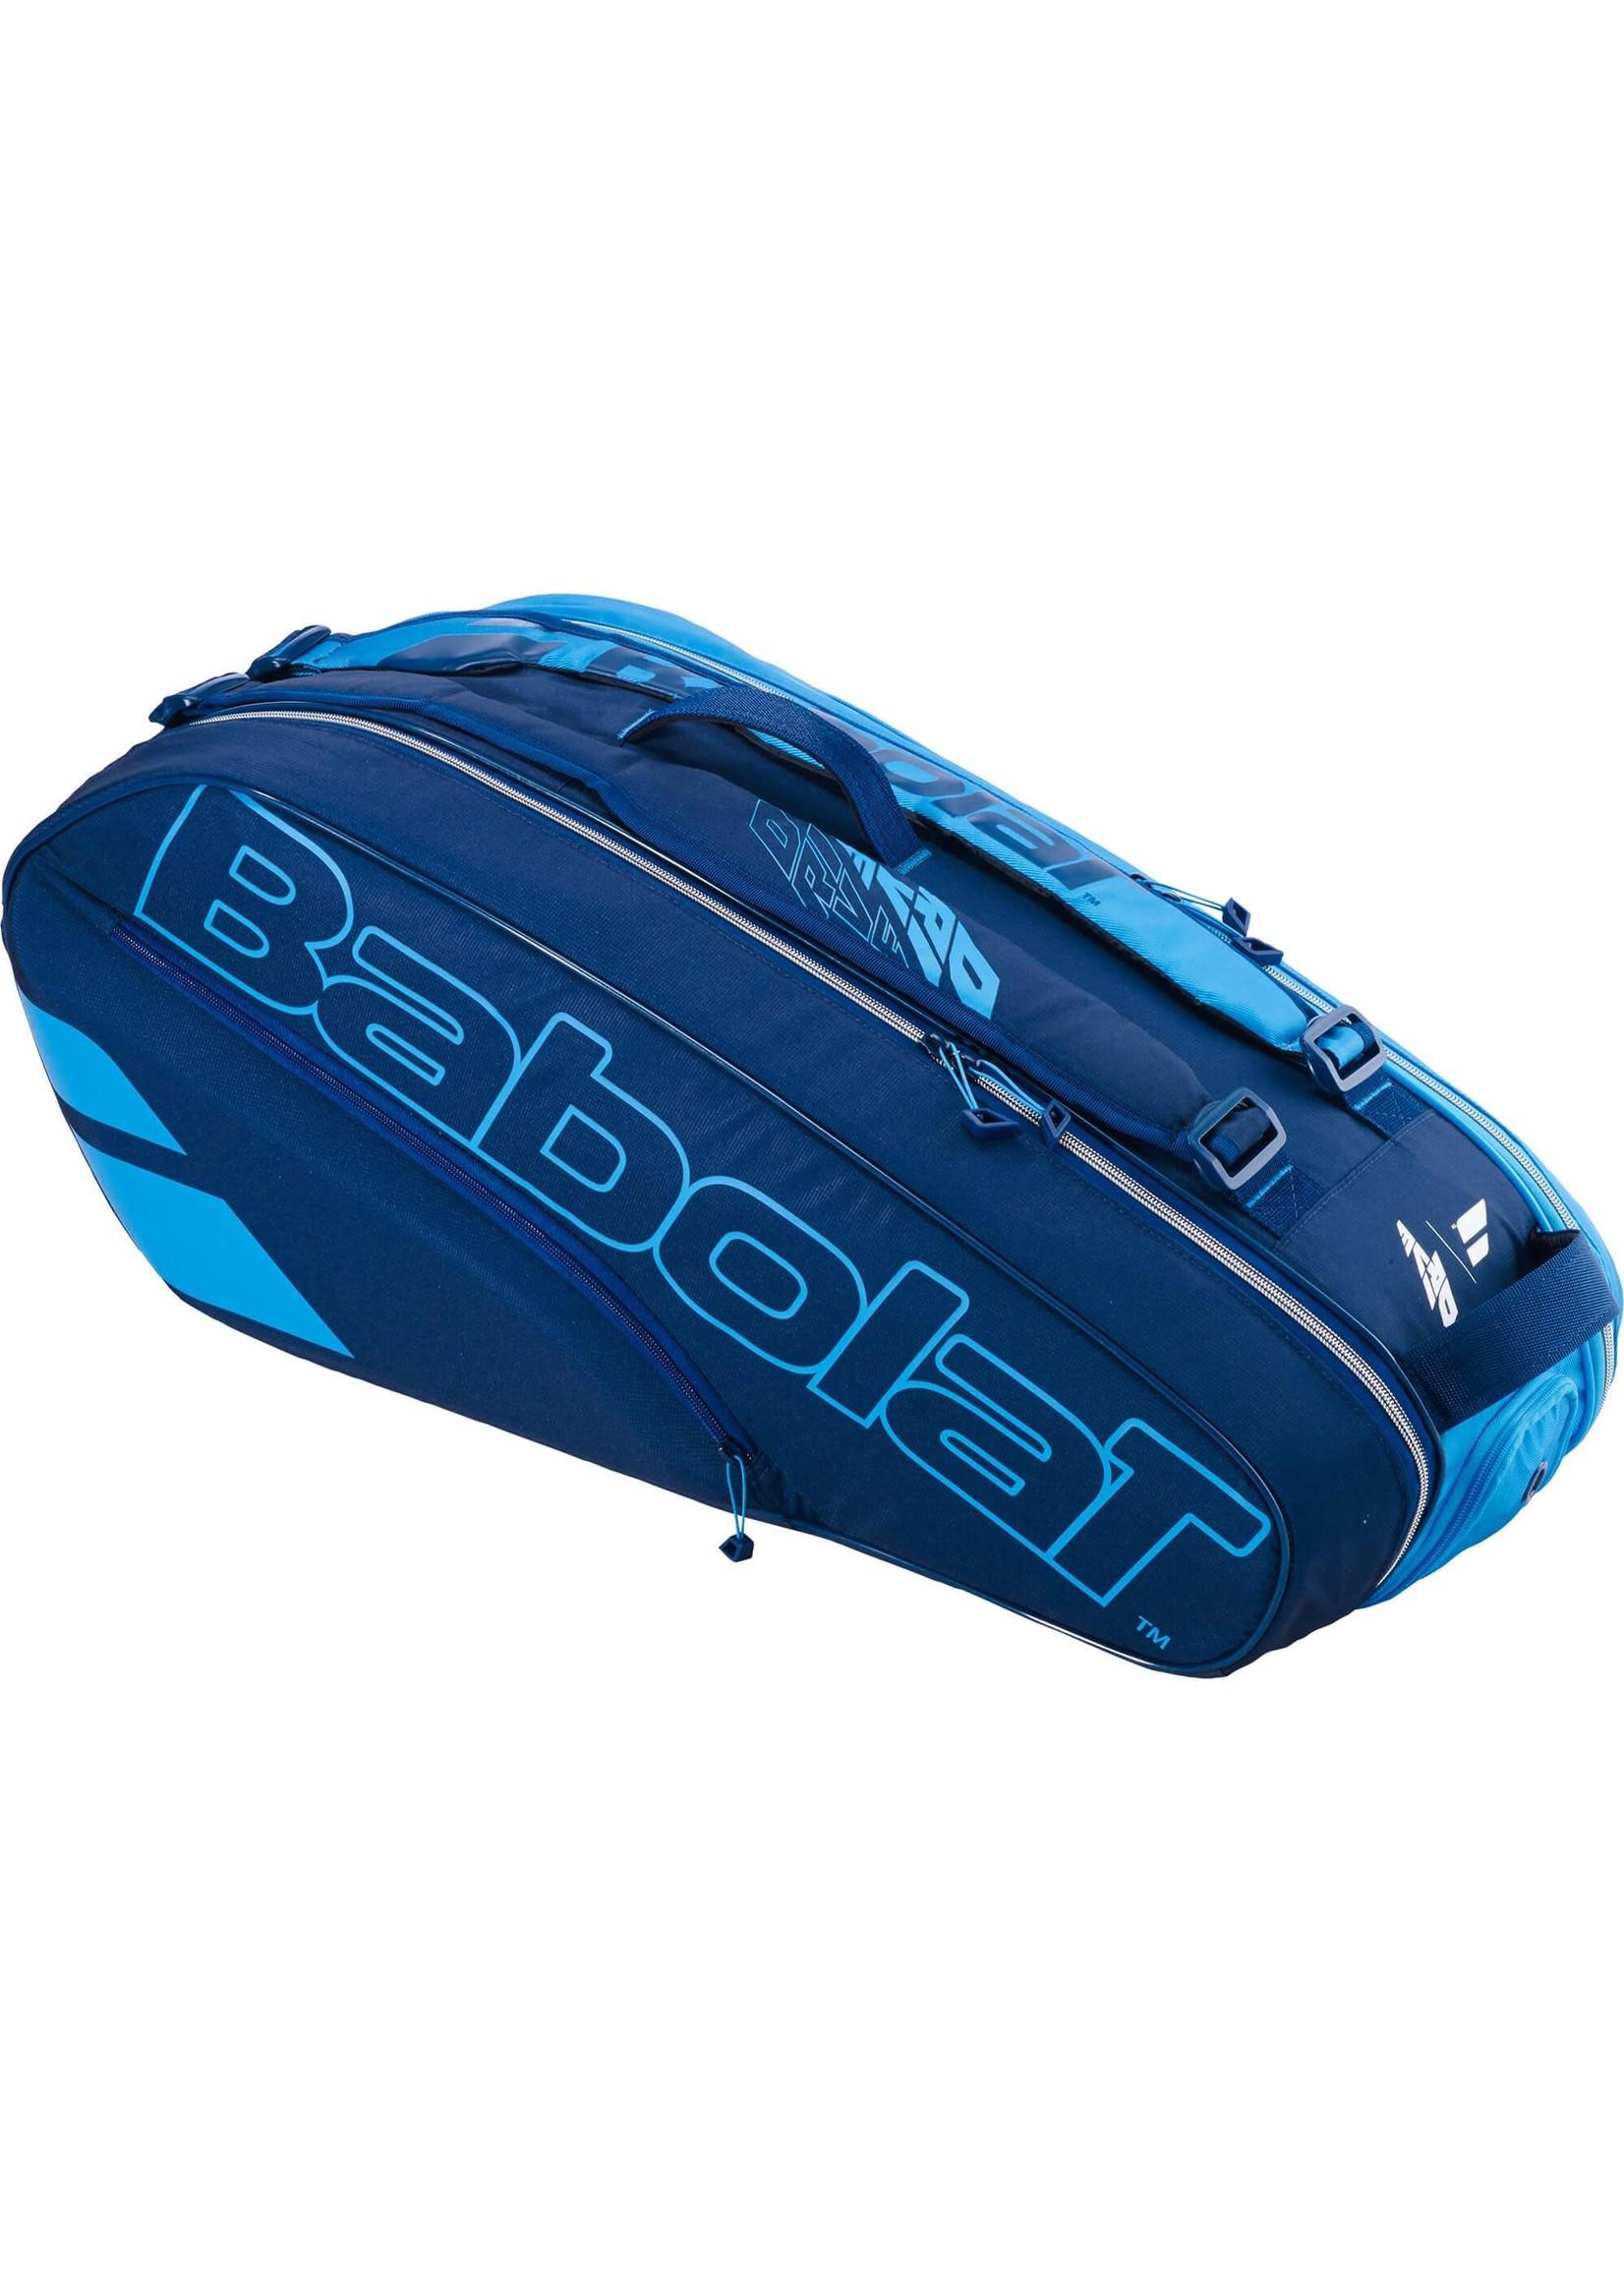 Babolat Babolat Pure Drive 6 Racket Bag (2021)